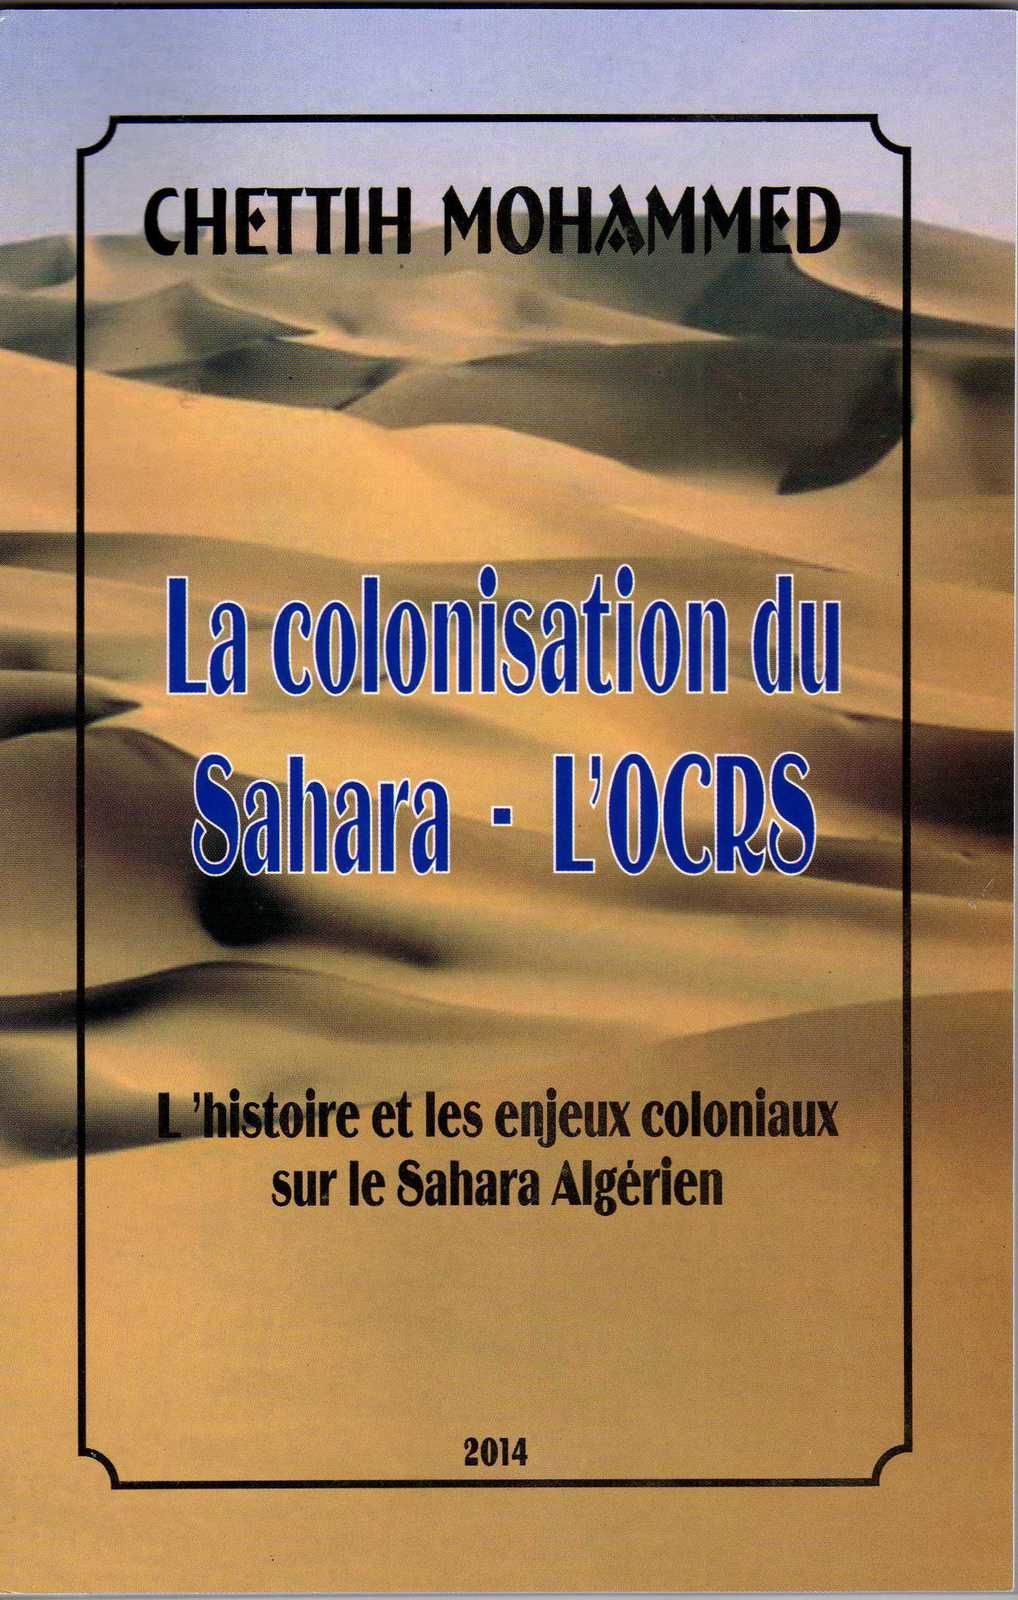 La colonisation du Sahara ..... L'OCRS